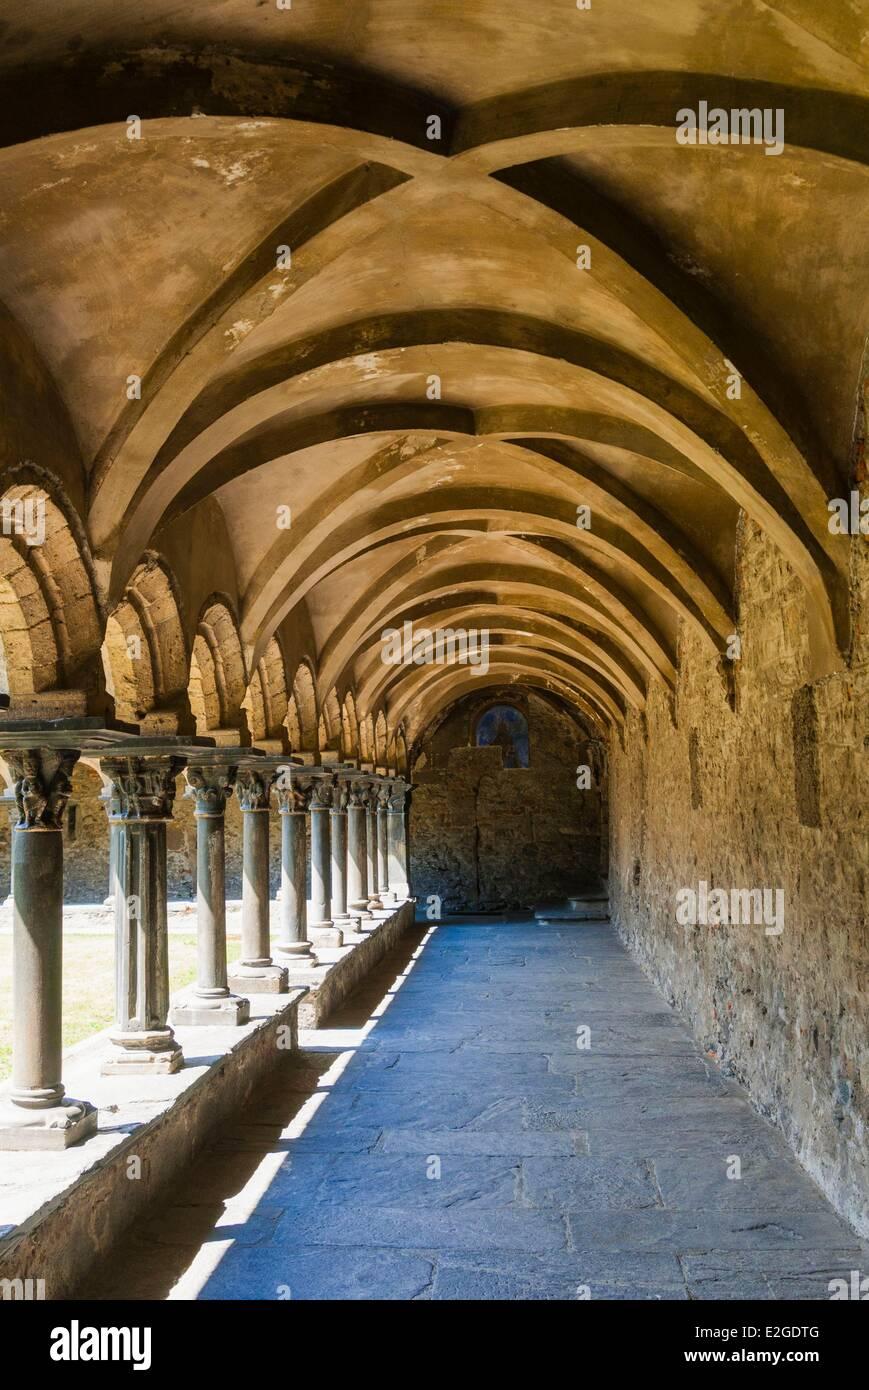 Italy Aosta Valley Aosta Cloister (Chiostro romanico 12th century) Sant'Orso or Saint-Ours collegiate church - Stock Image